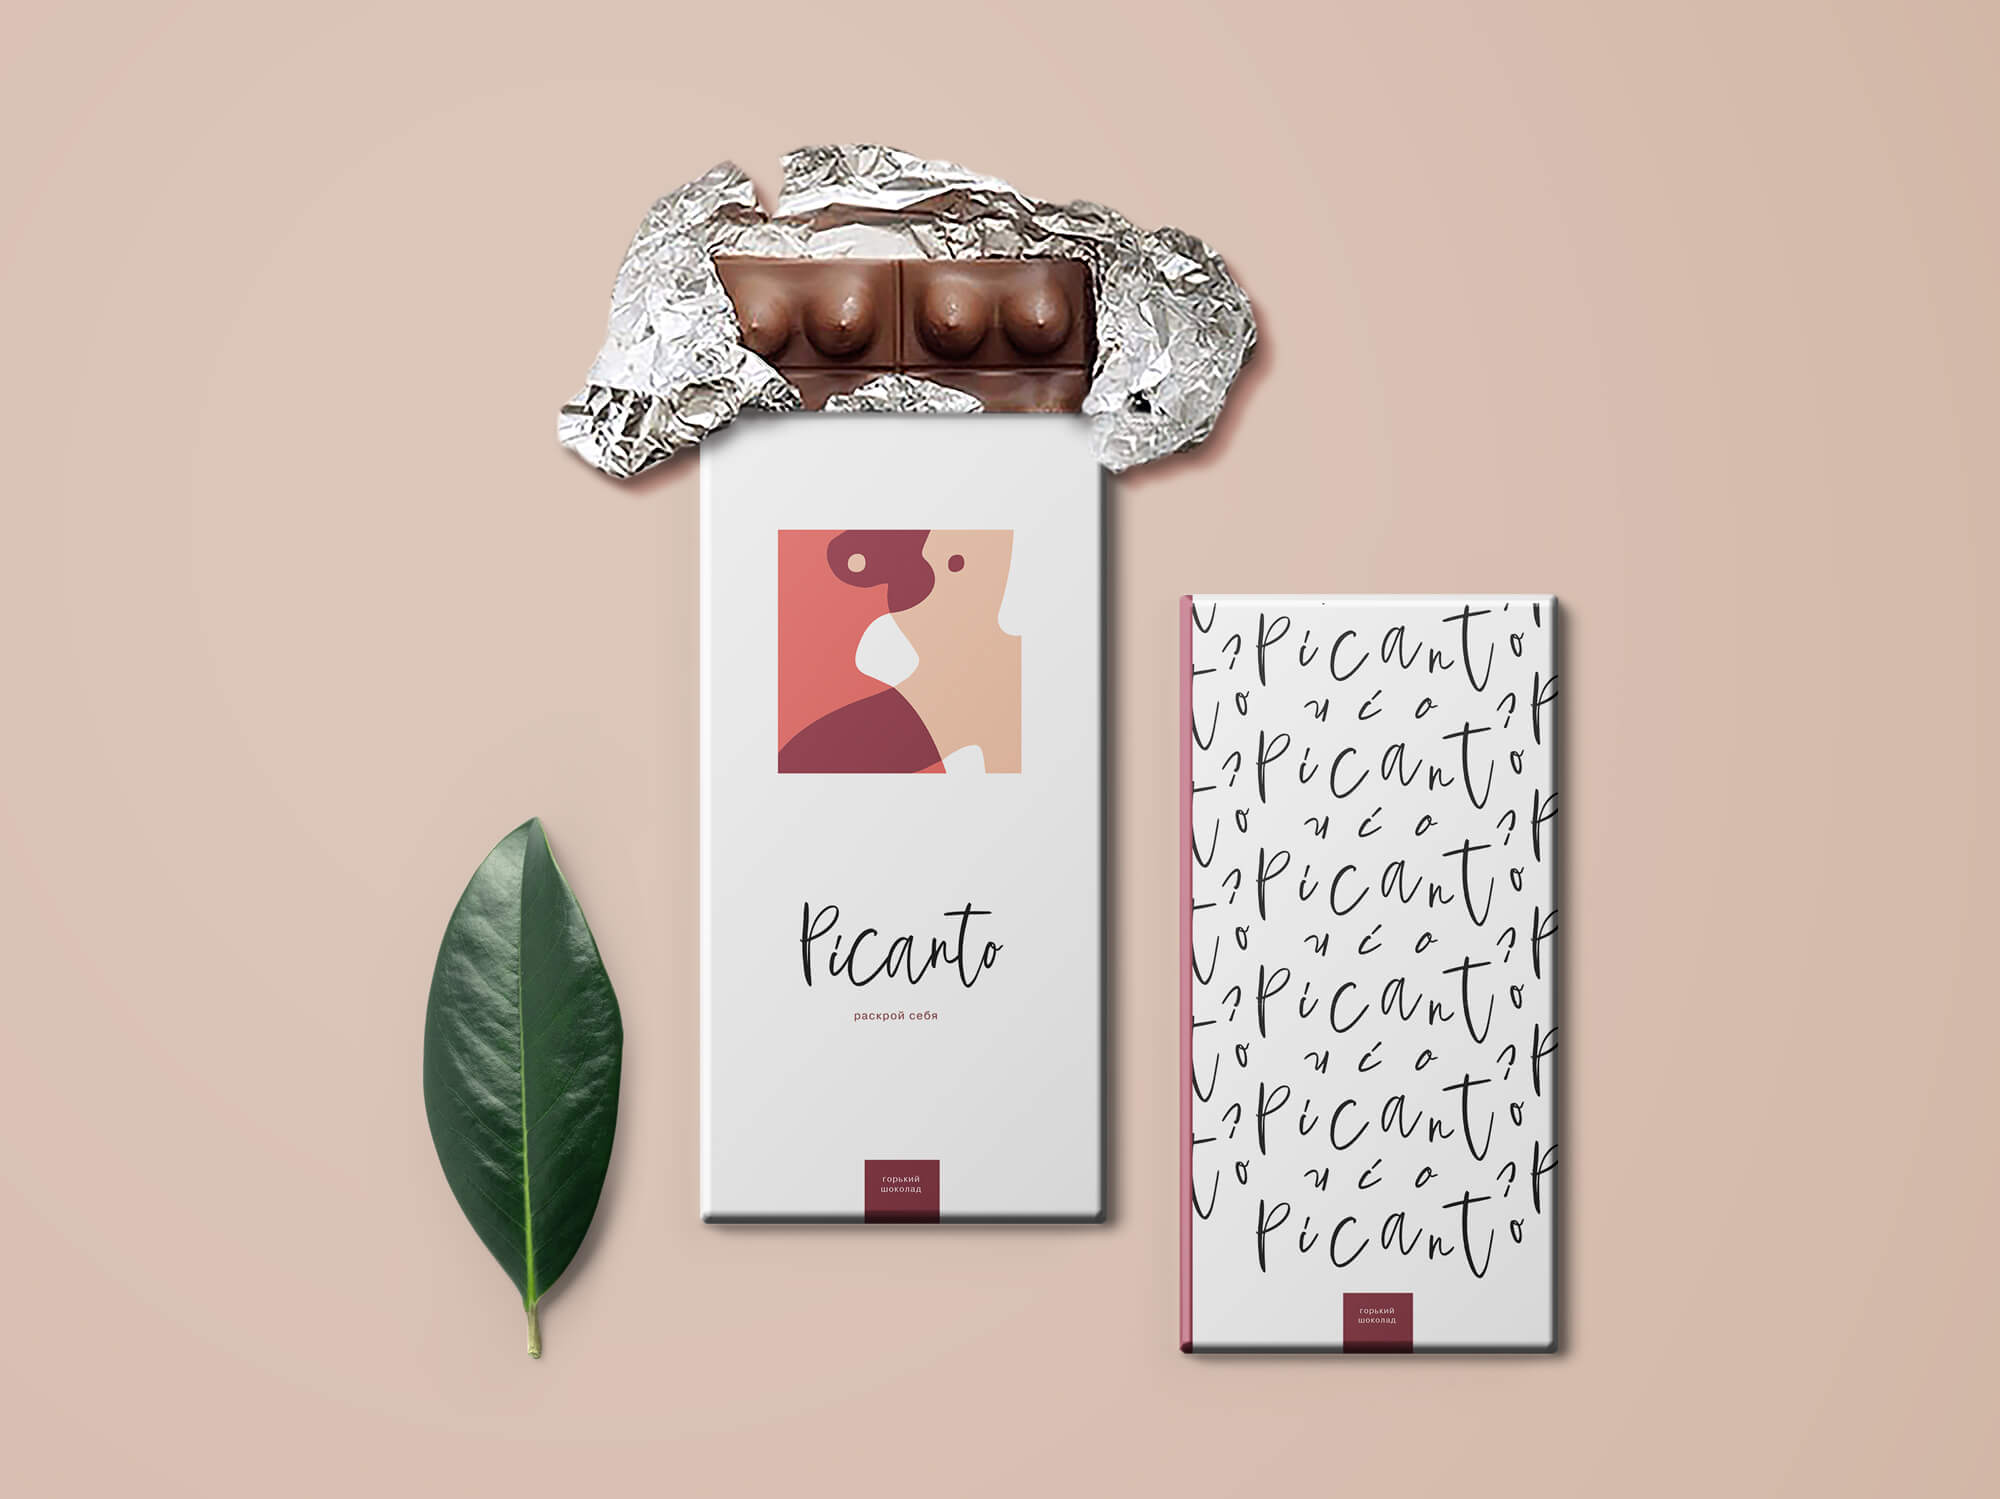 Фирменный стиль бренда Picanto - шоколад